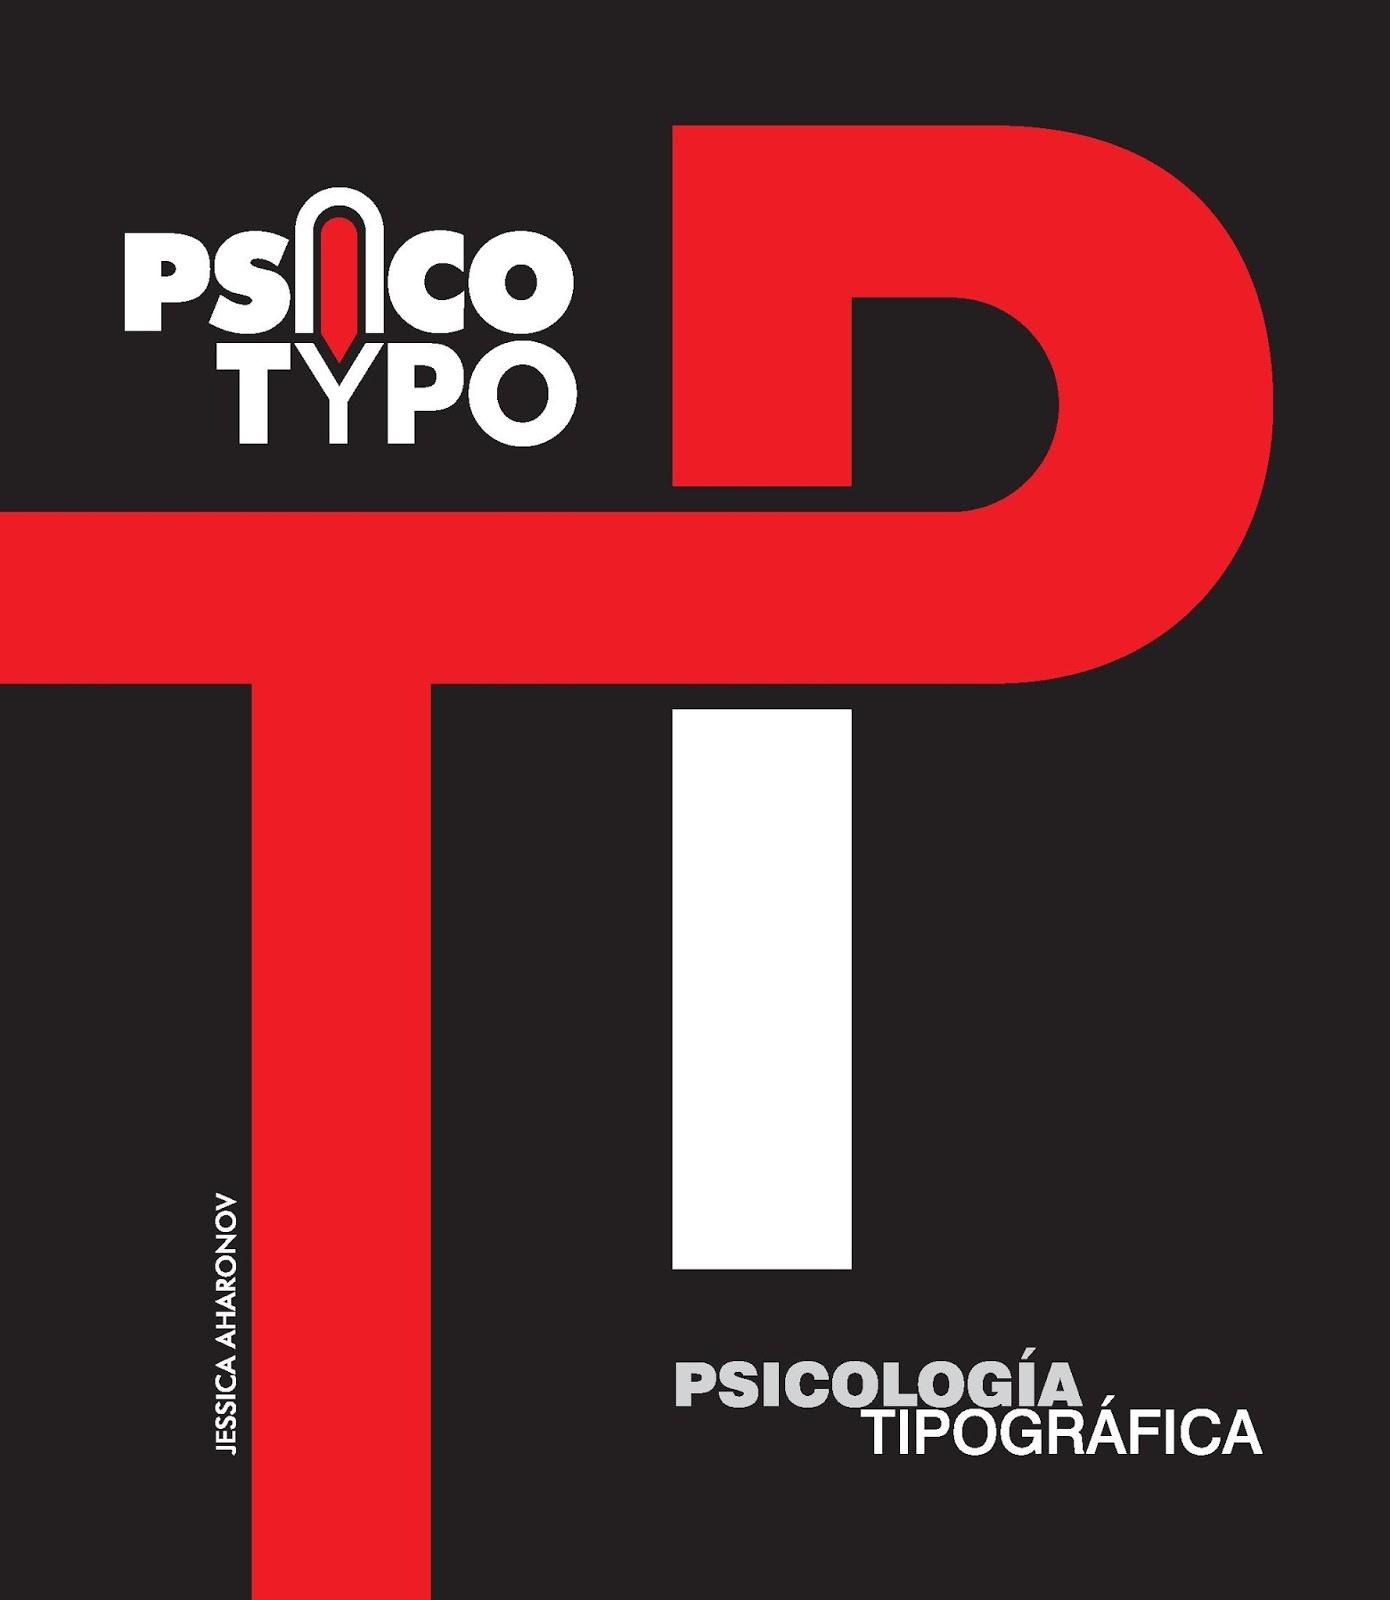 Psicología Tipográfica – Jessica Aharonov